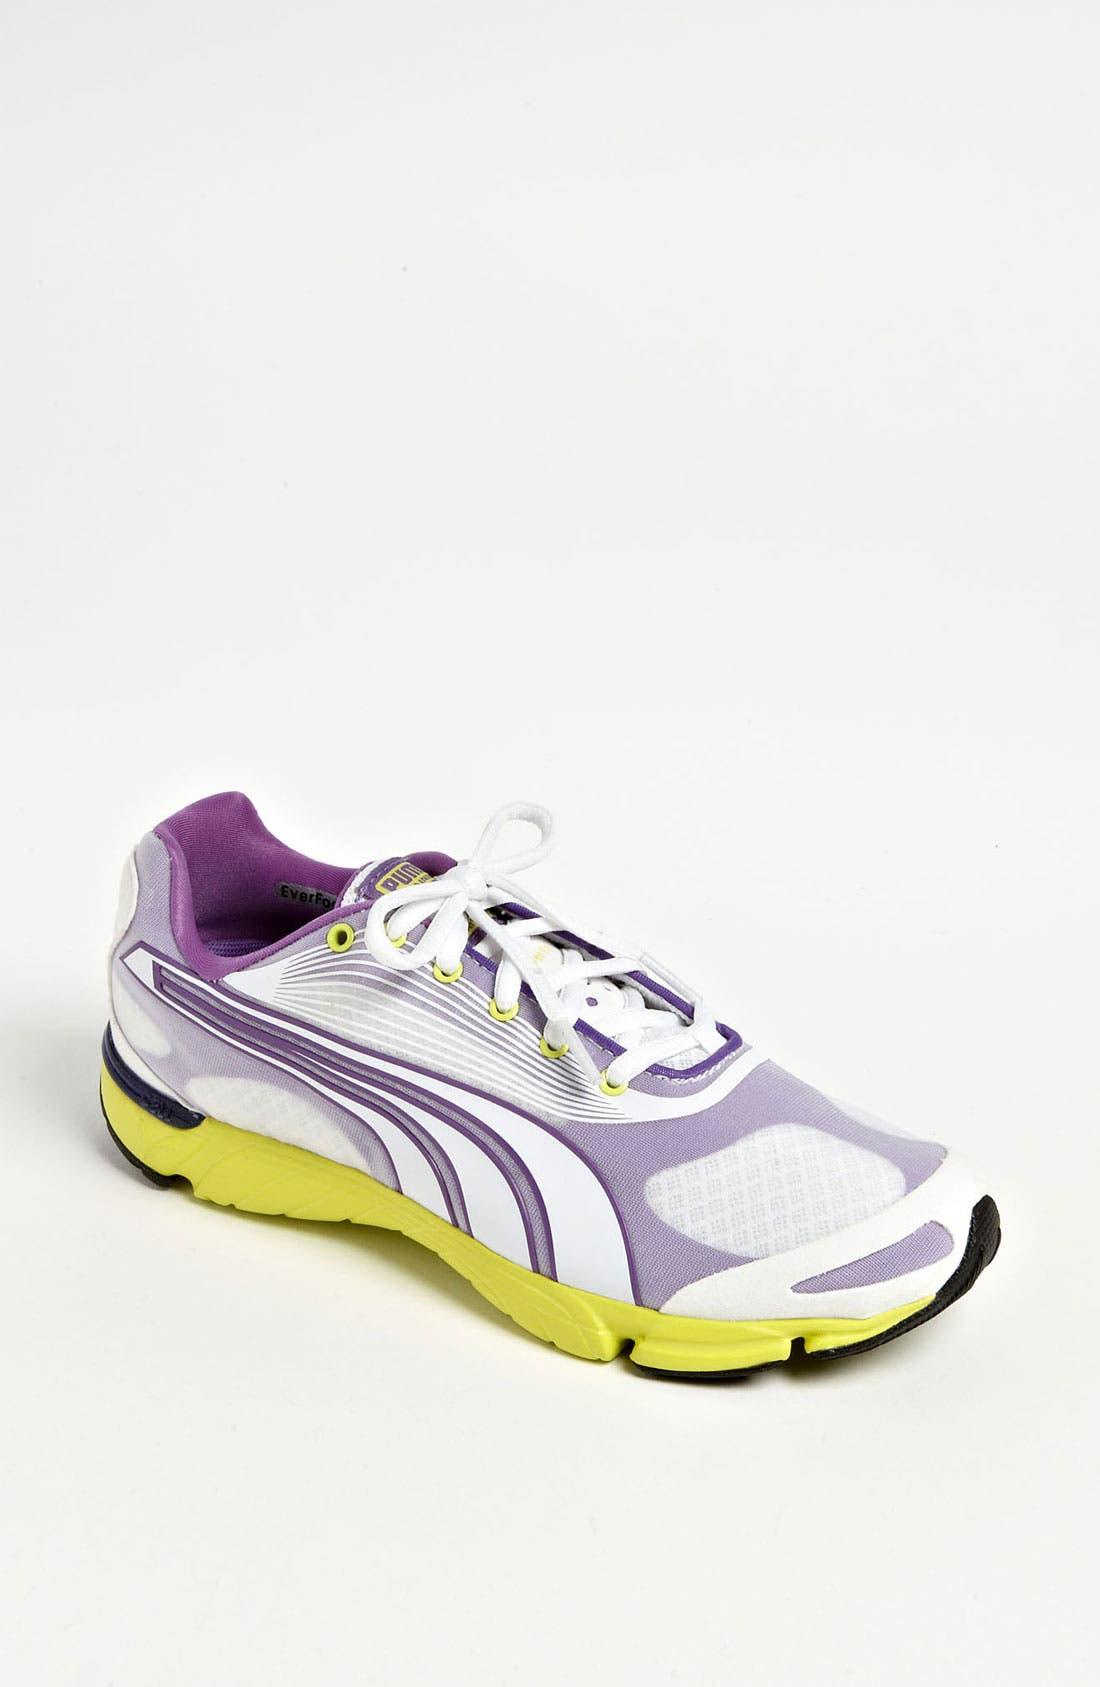 Main Image - PUMA 'Formlite XT 2' Sneaker (Women)